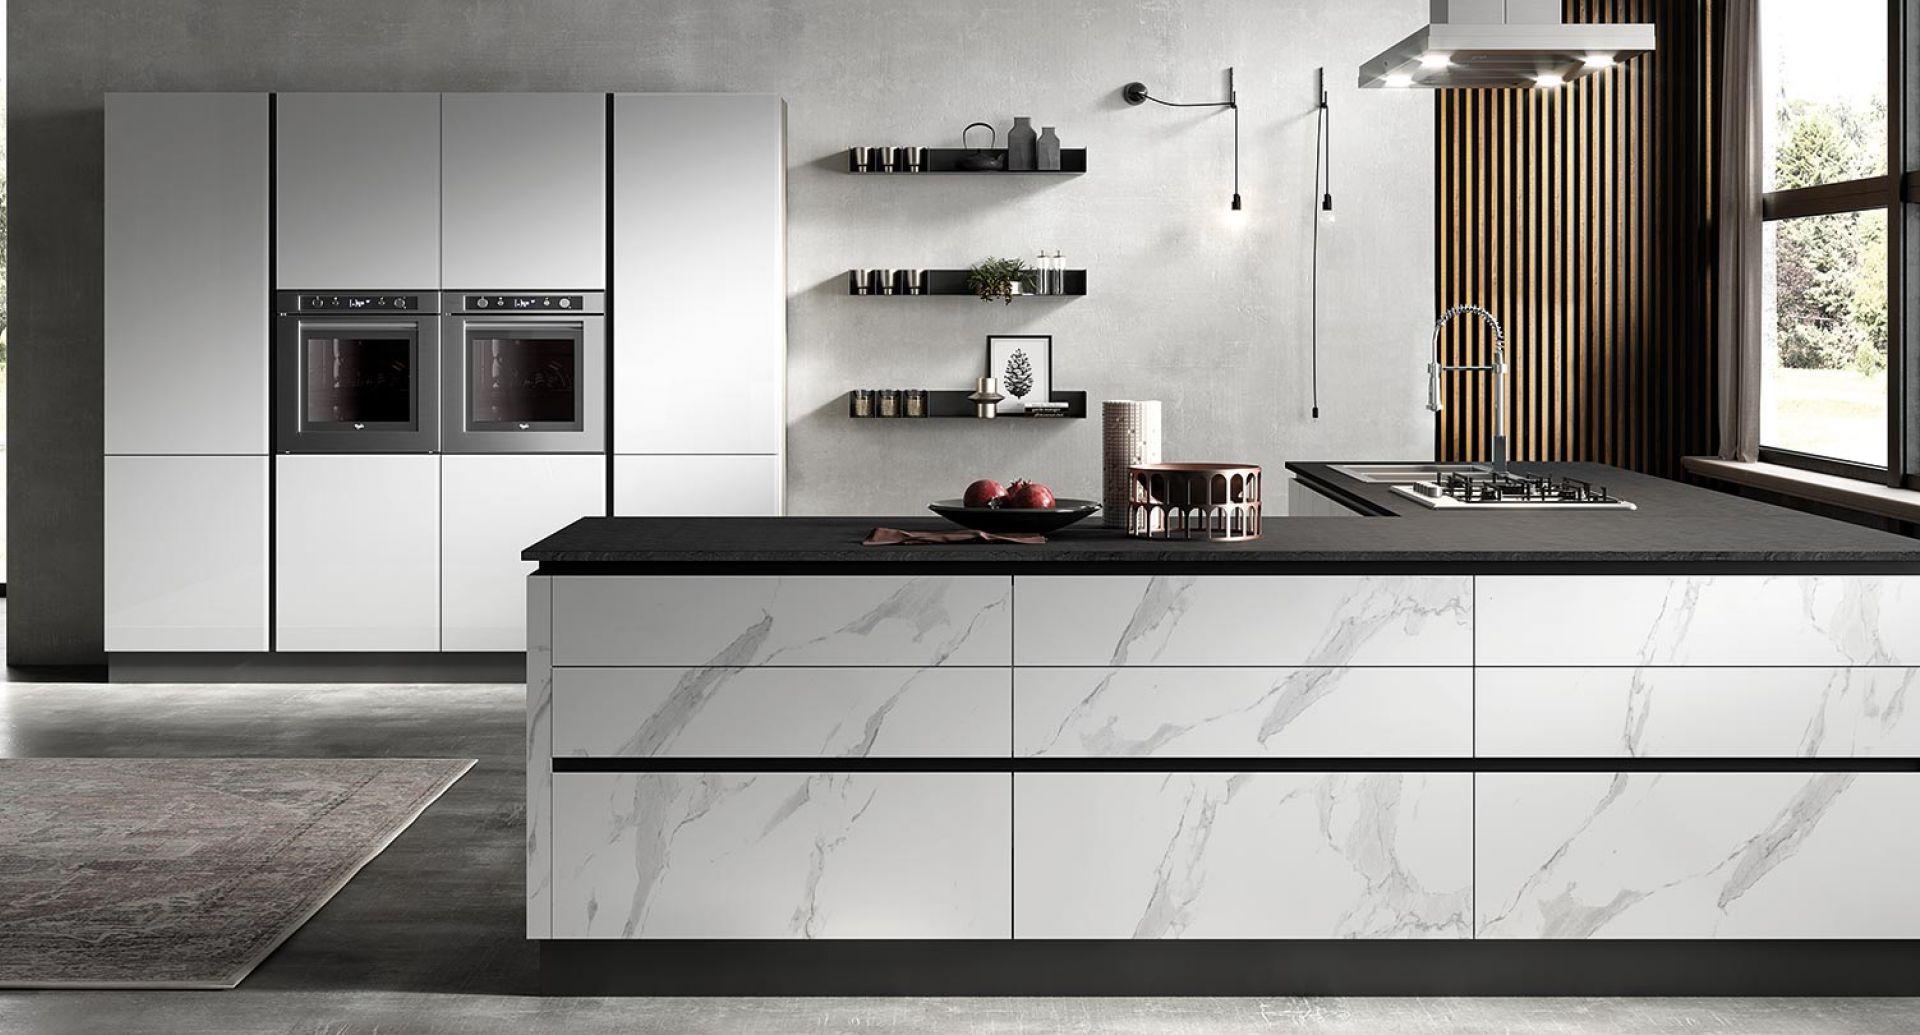 evo-cucina-eos-effetto-marmo-glass-bianco-opaco